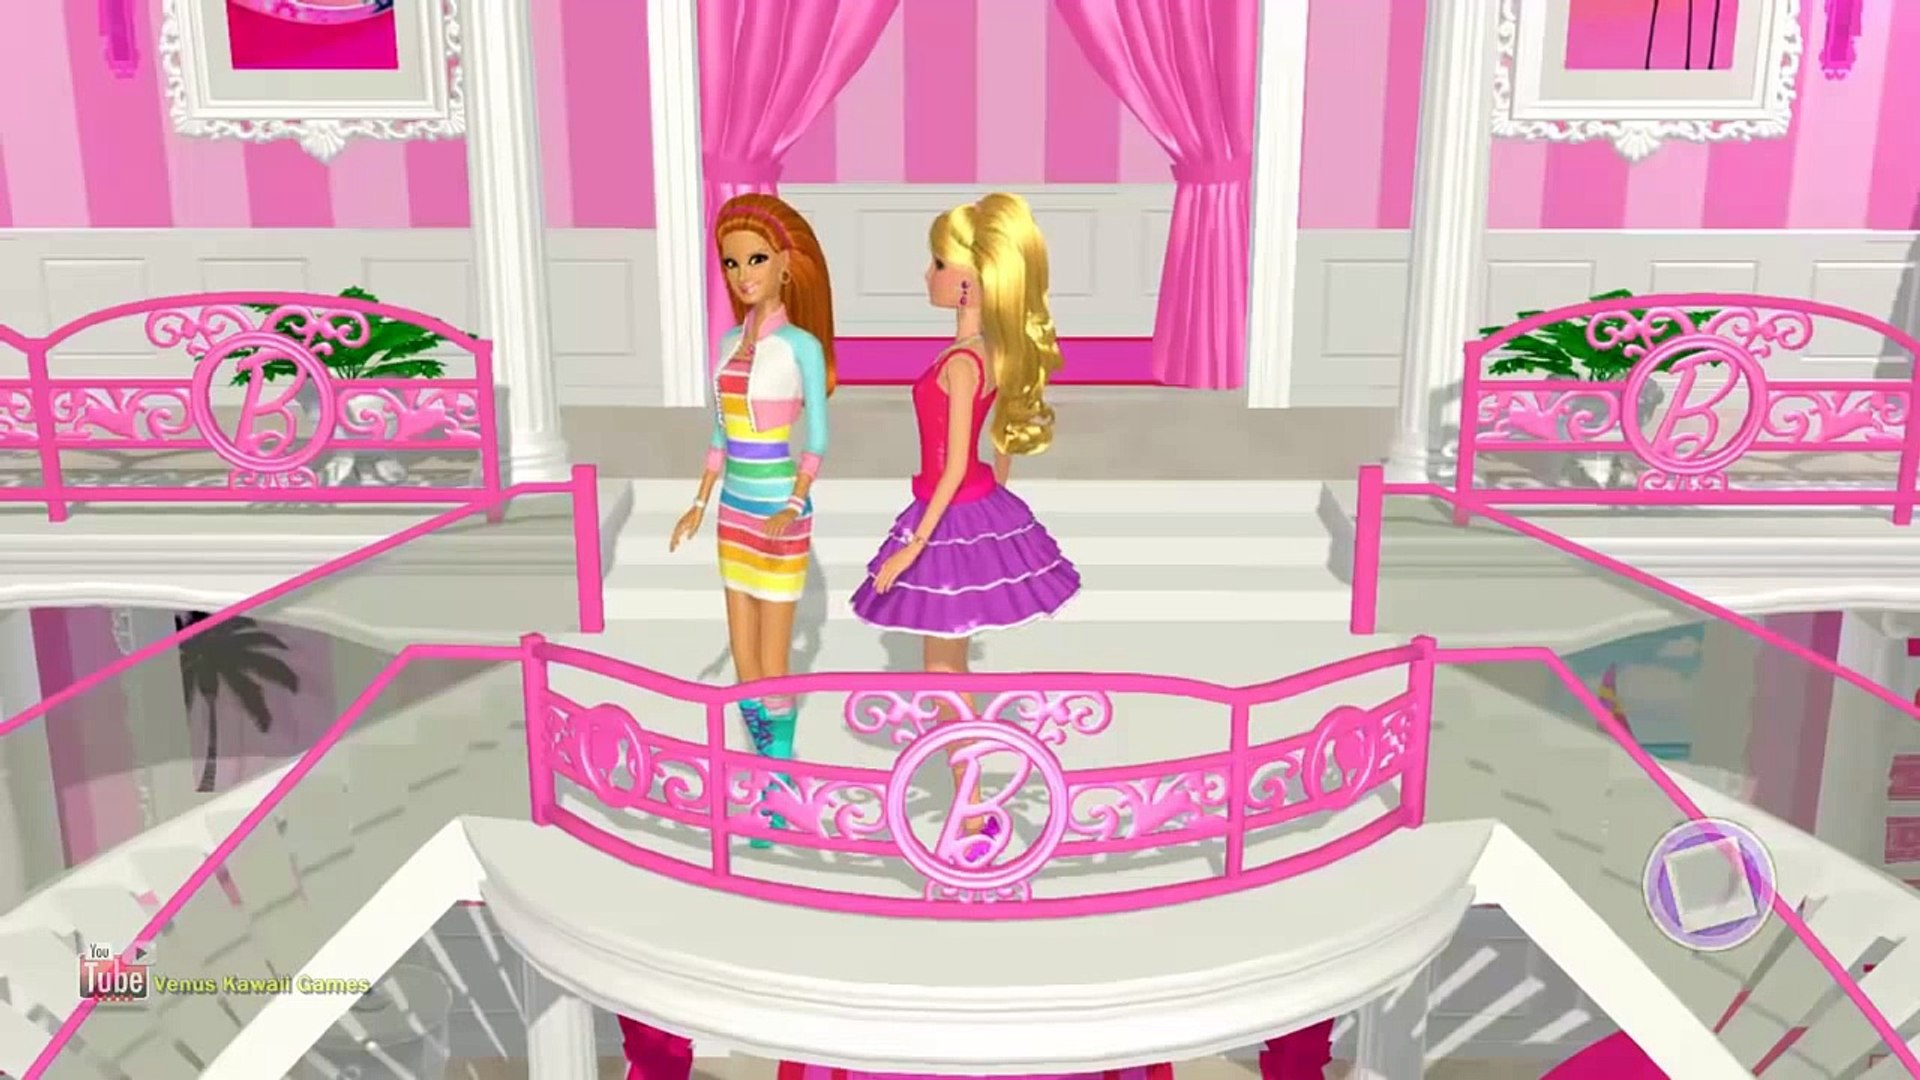 KIDS PLAY MAKEUP APPS?! (Kids Re: Gaming) Barbie Dreamhouse Party Game Walkthrough Shoe